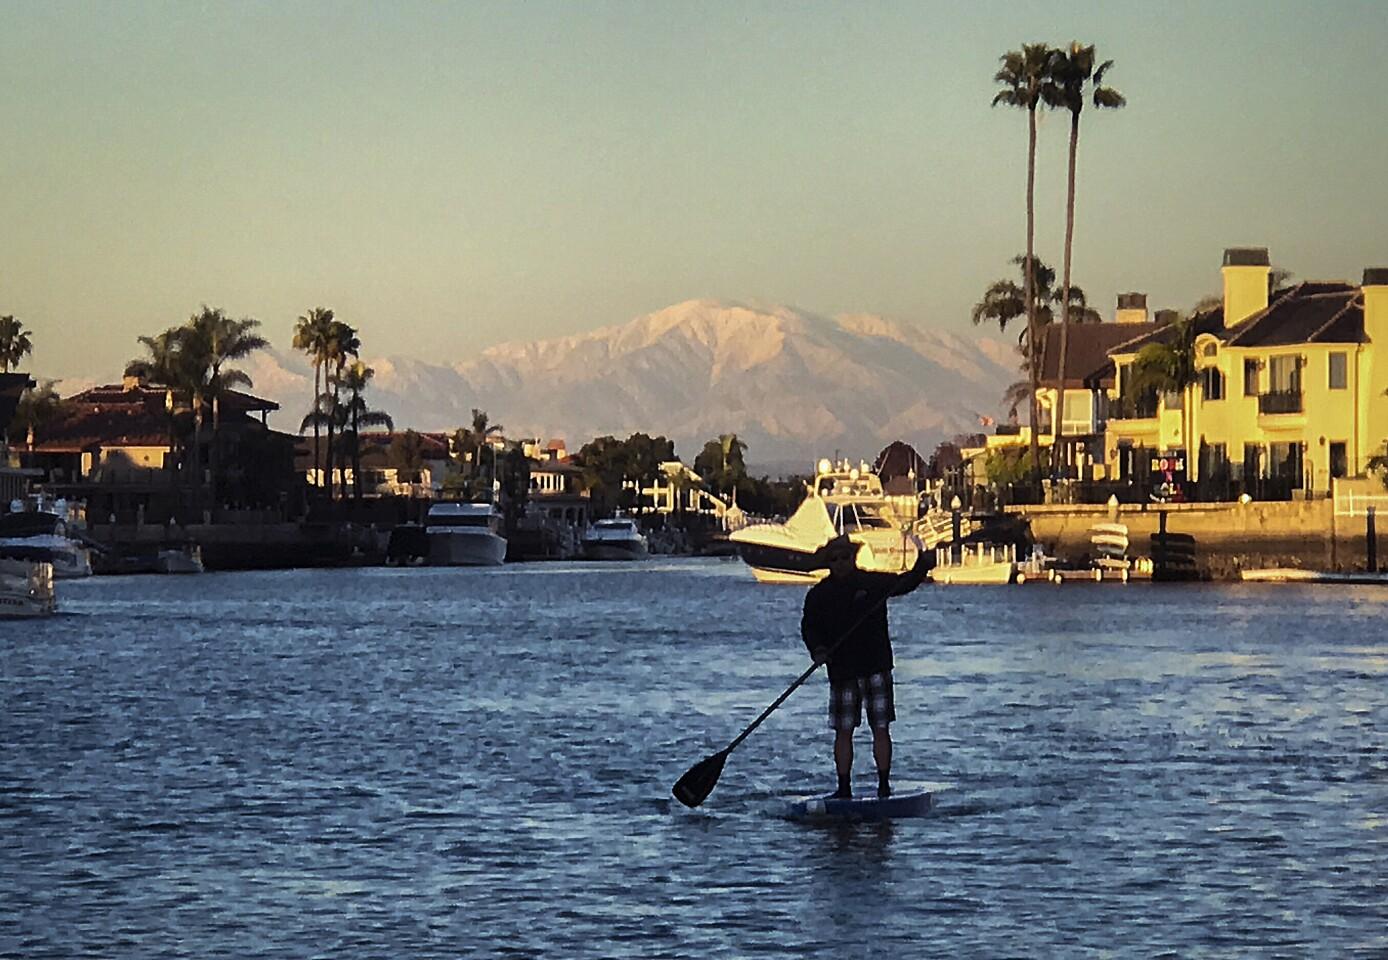 la-me-paddleboard